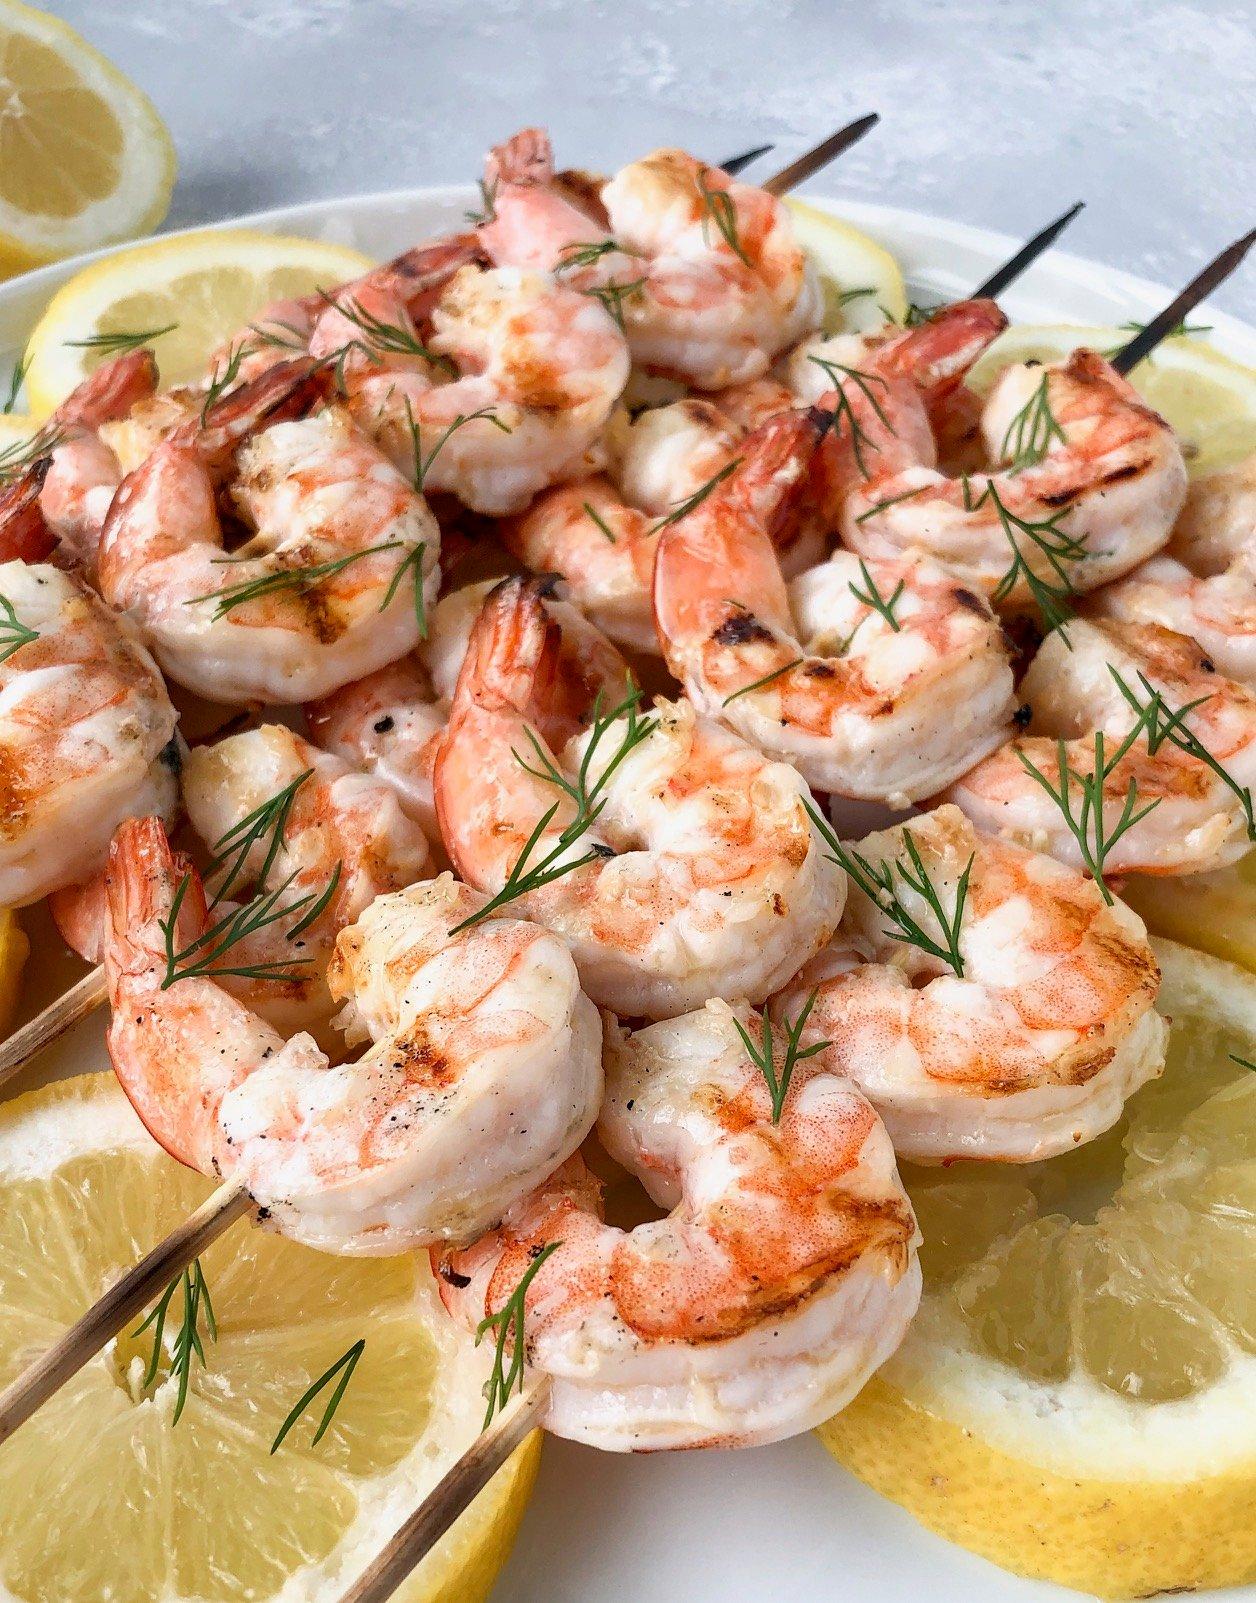 Grilled garlic butter dill shrimp over lemon